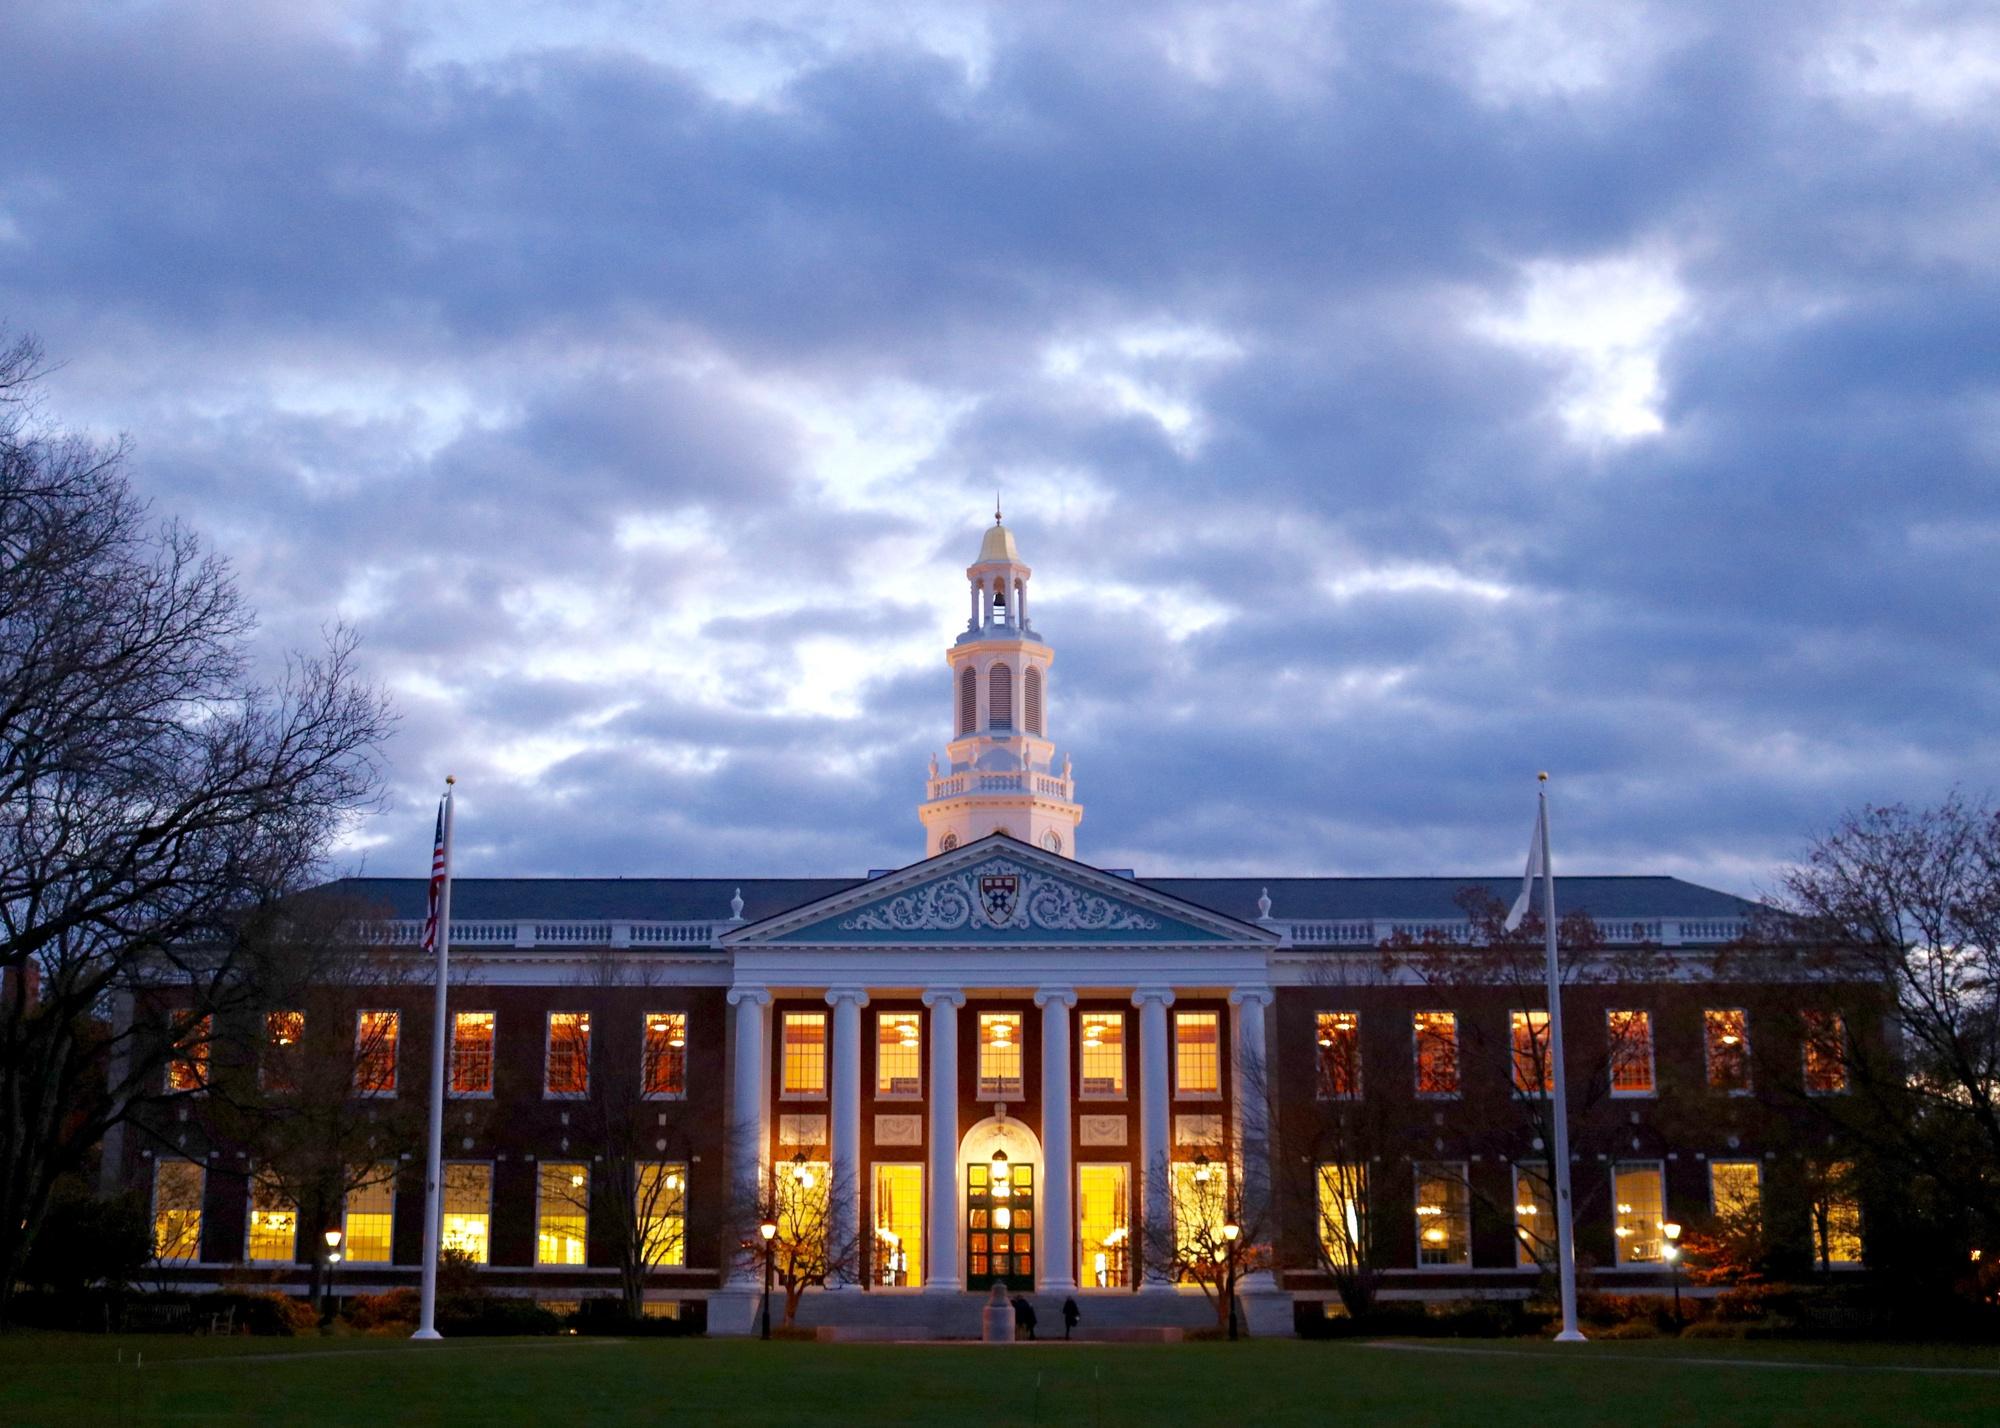 Harvard Business School's Baker Library at dusk.